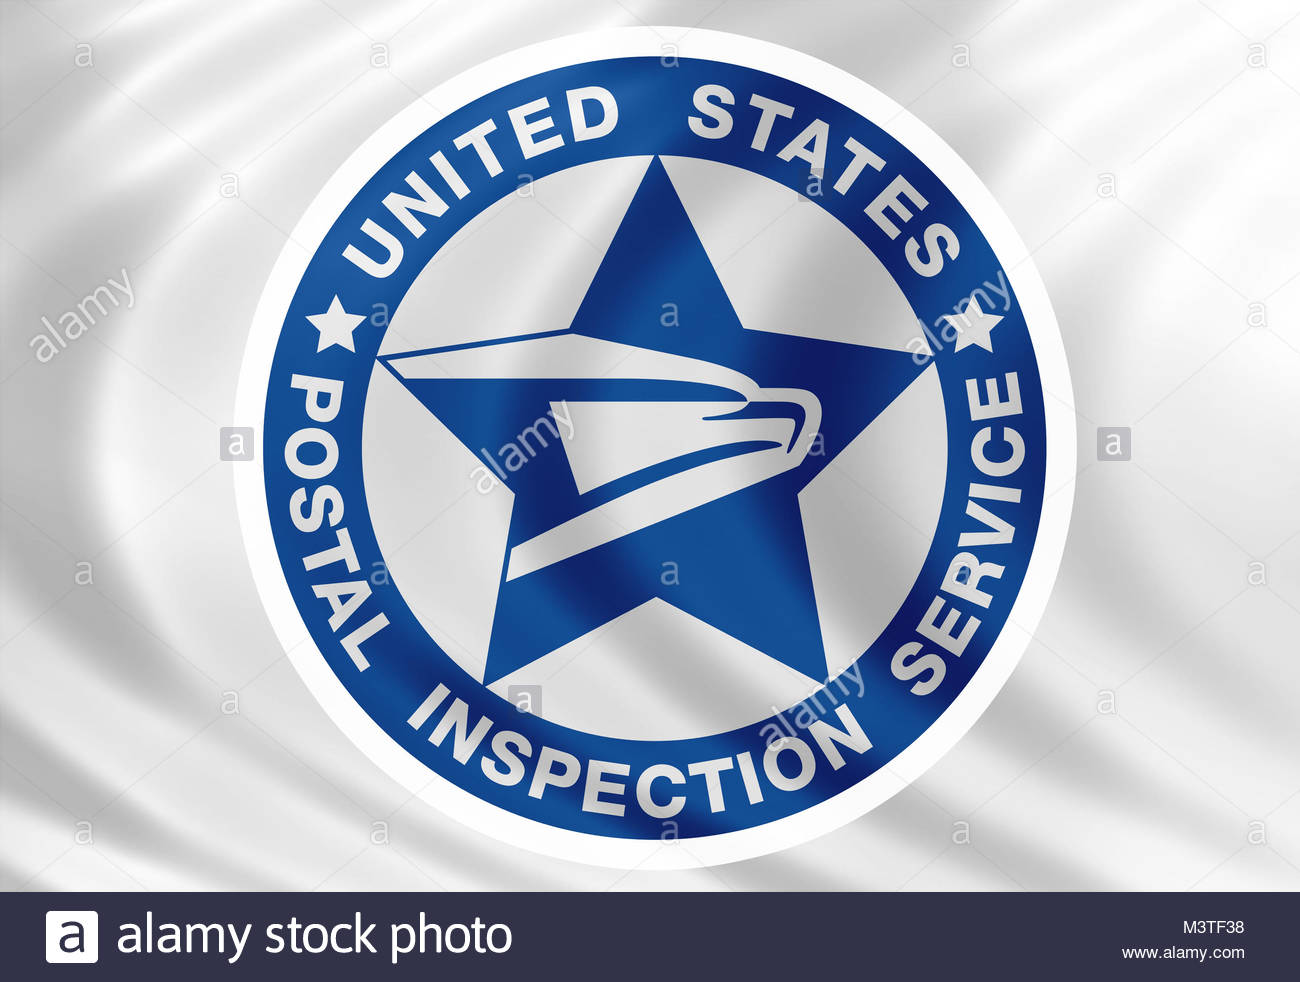 United States Postal Inspection Service USPIS icon logo